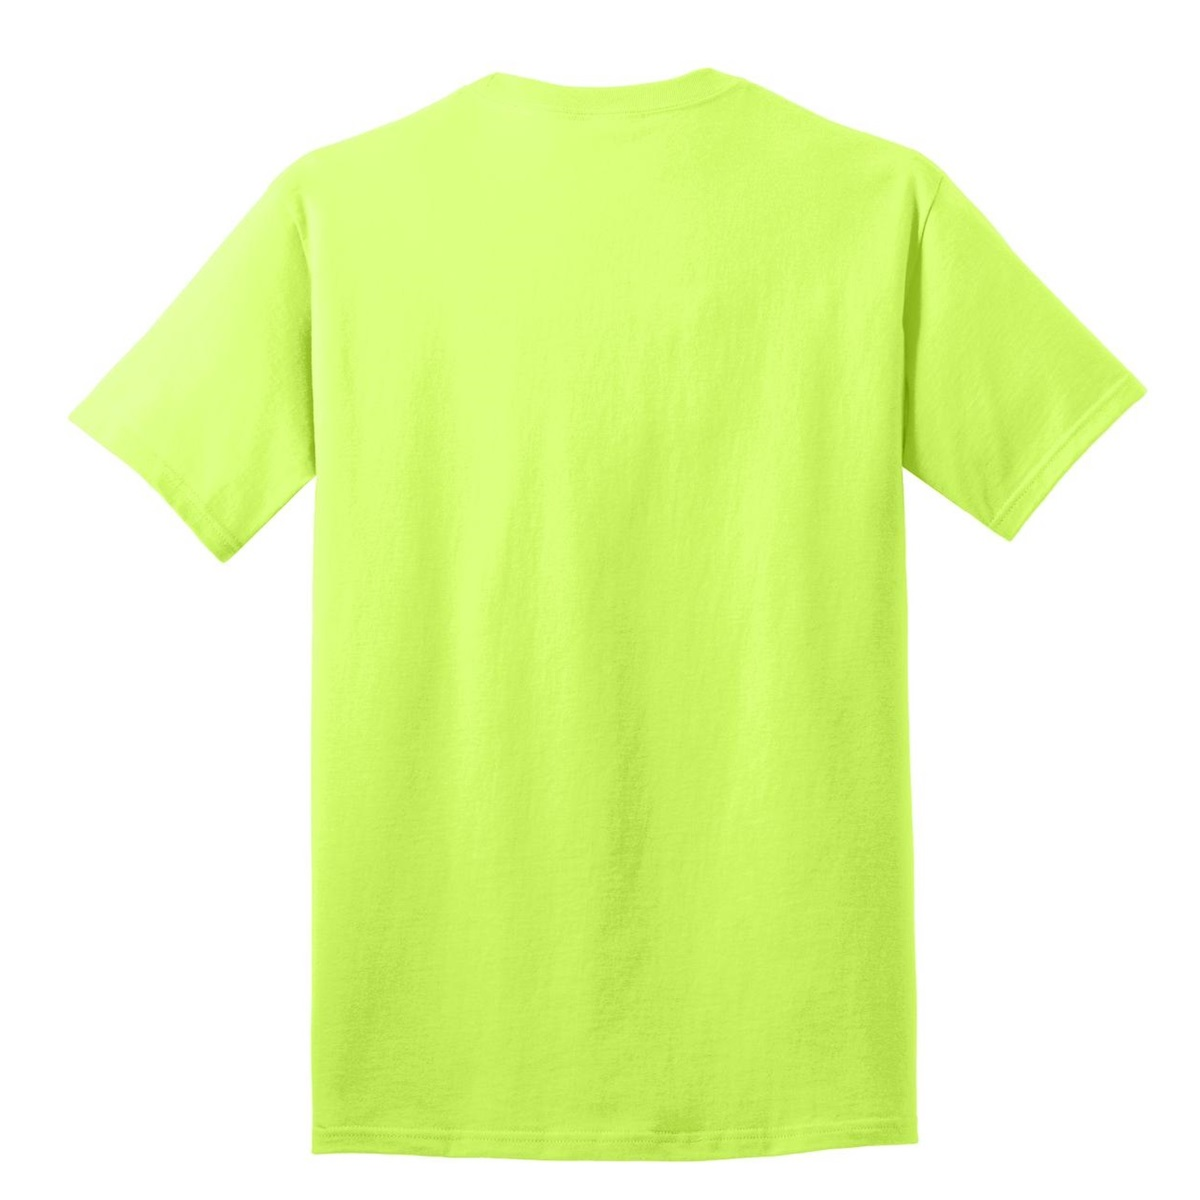 Port & Company PC54 5.4-oz 100% Cotton T-Shirt - Neon ...